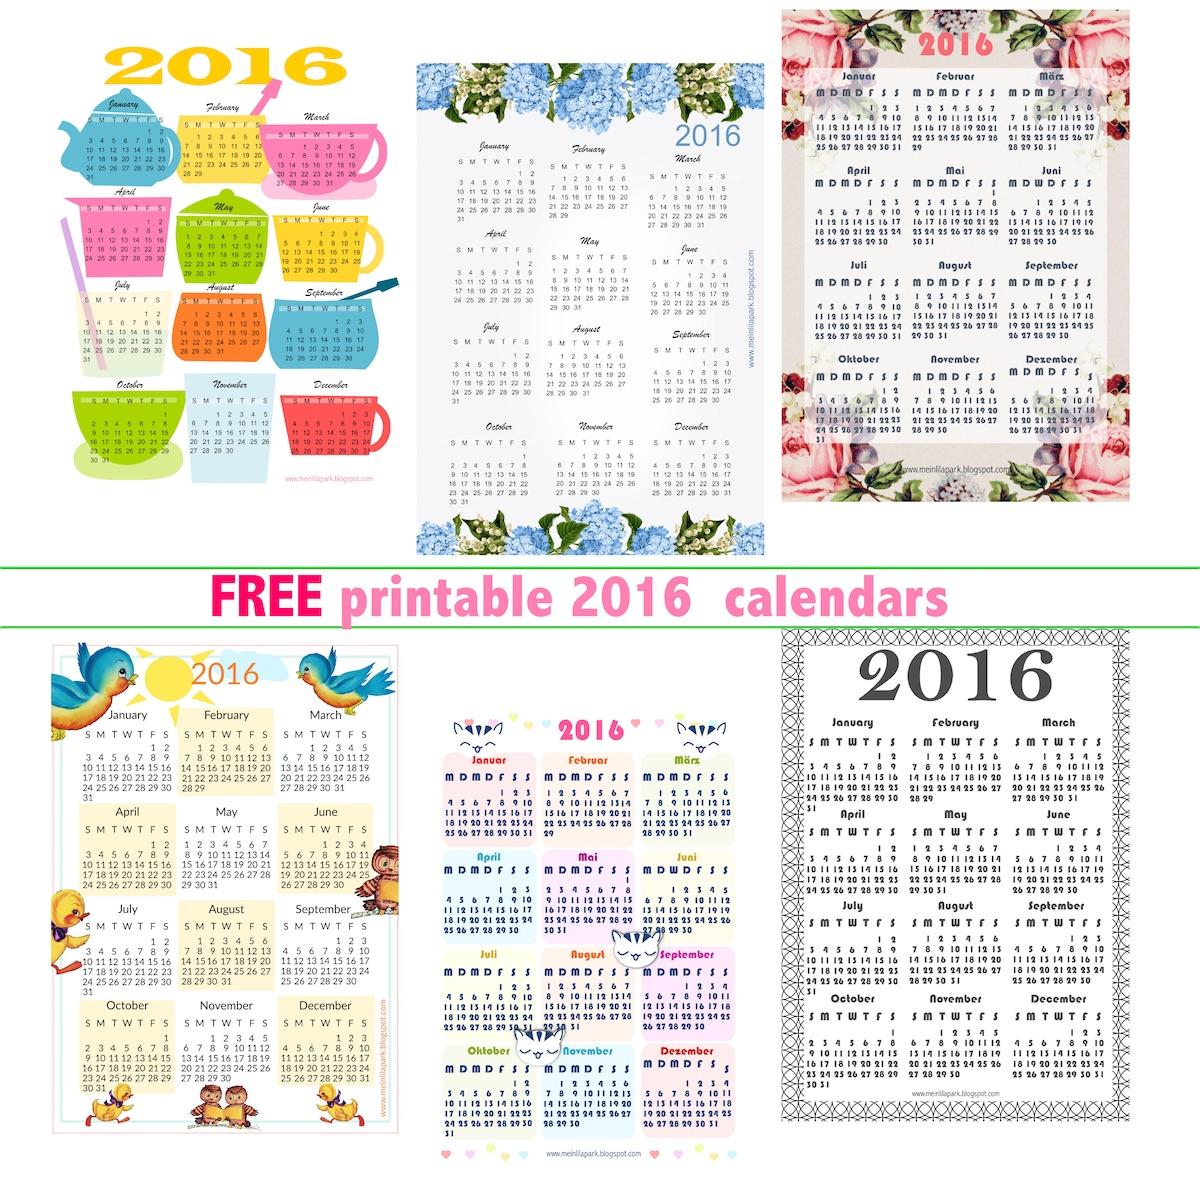 Over 42 free printable 2016 calendars - Kalender 2016 - freebie round ...